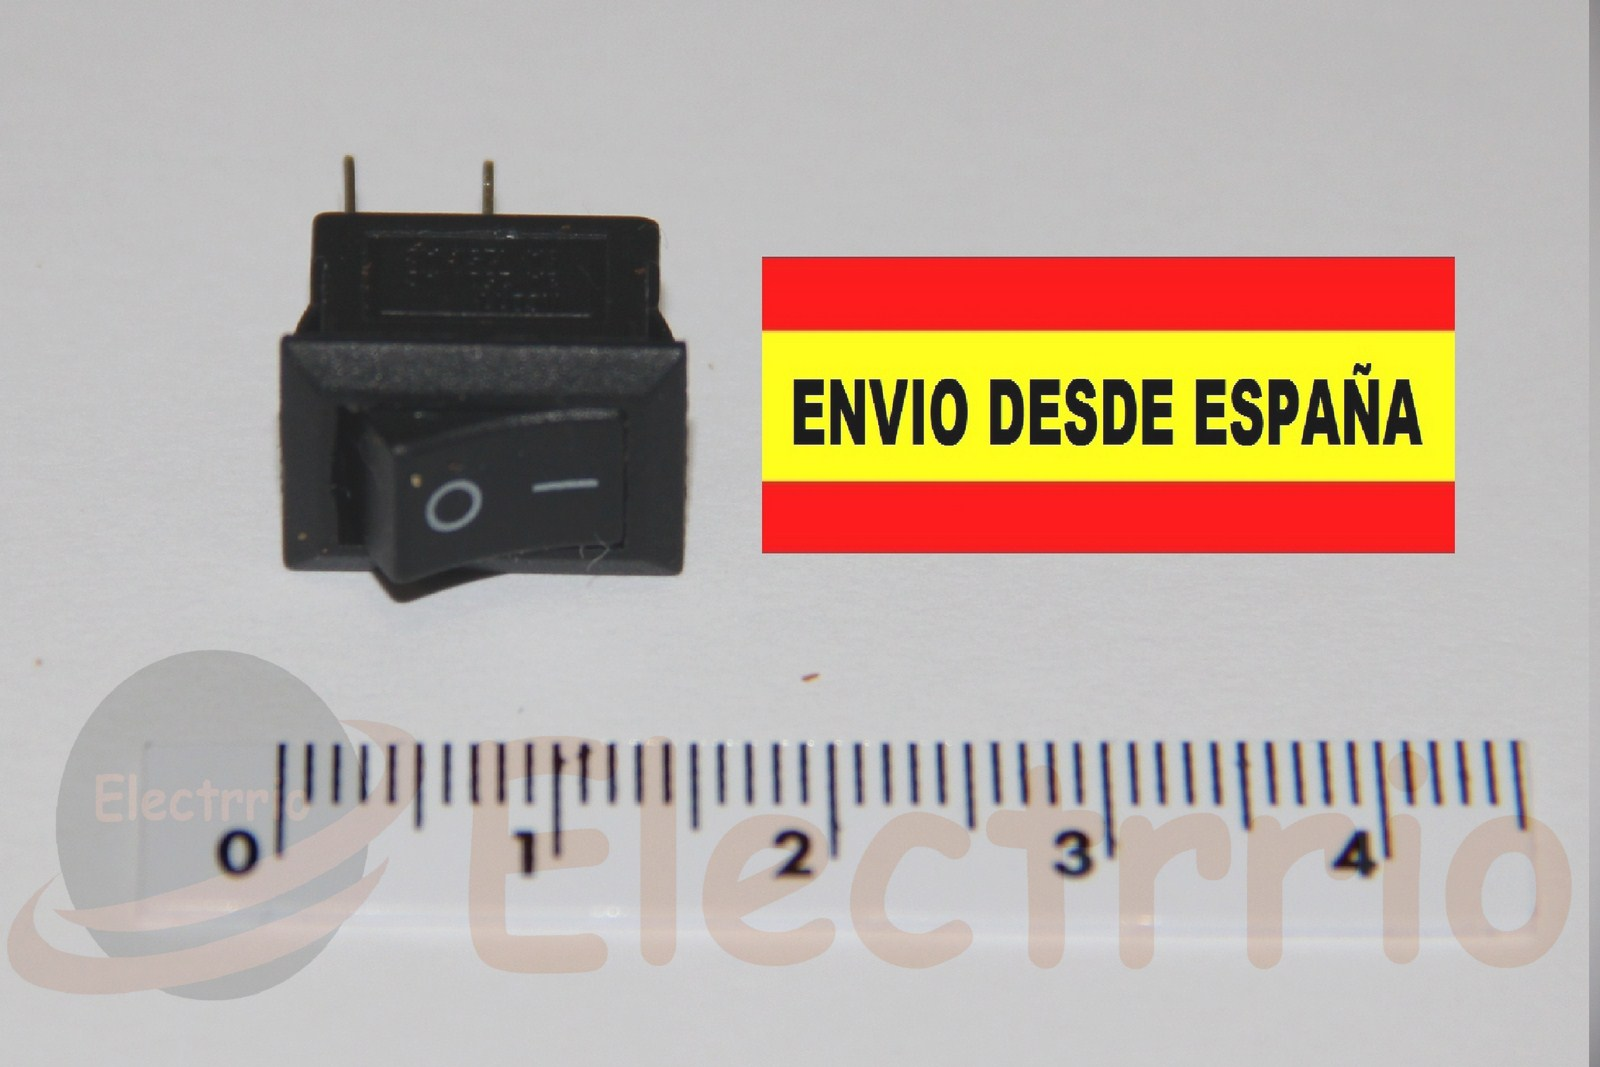 EL2215 MINI INTERRUPTOR 2 POSICIONES 250VAC 3A mininterruptor electrónica switch